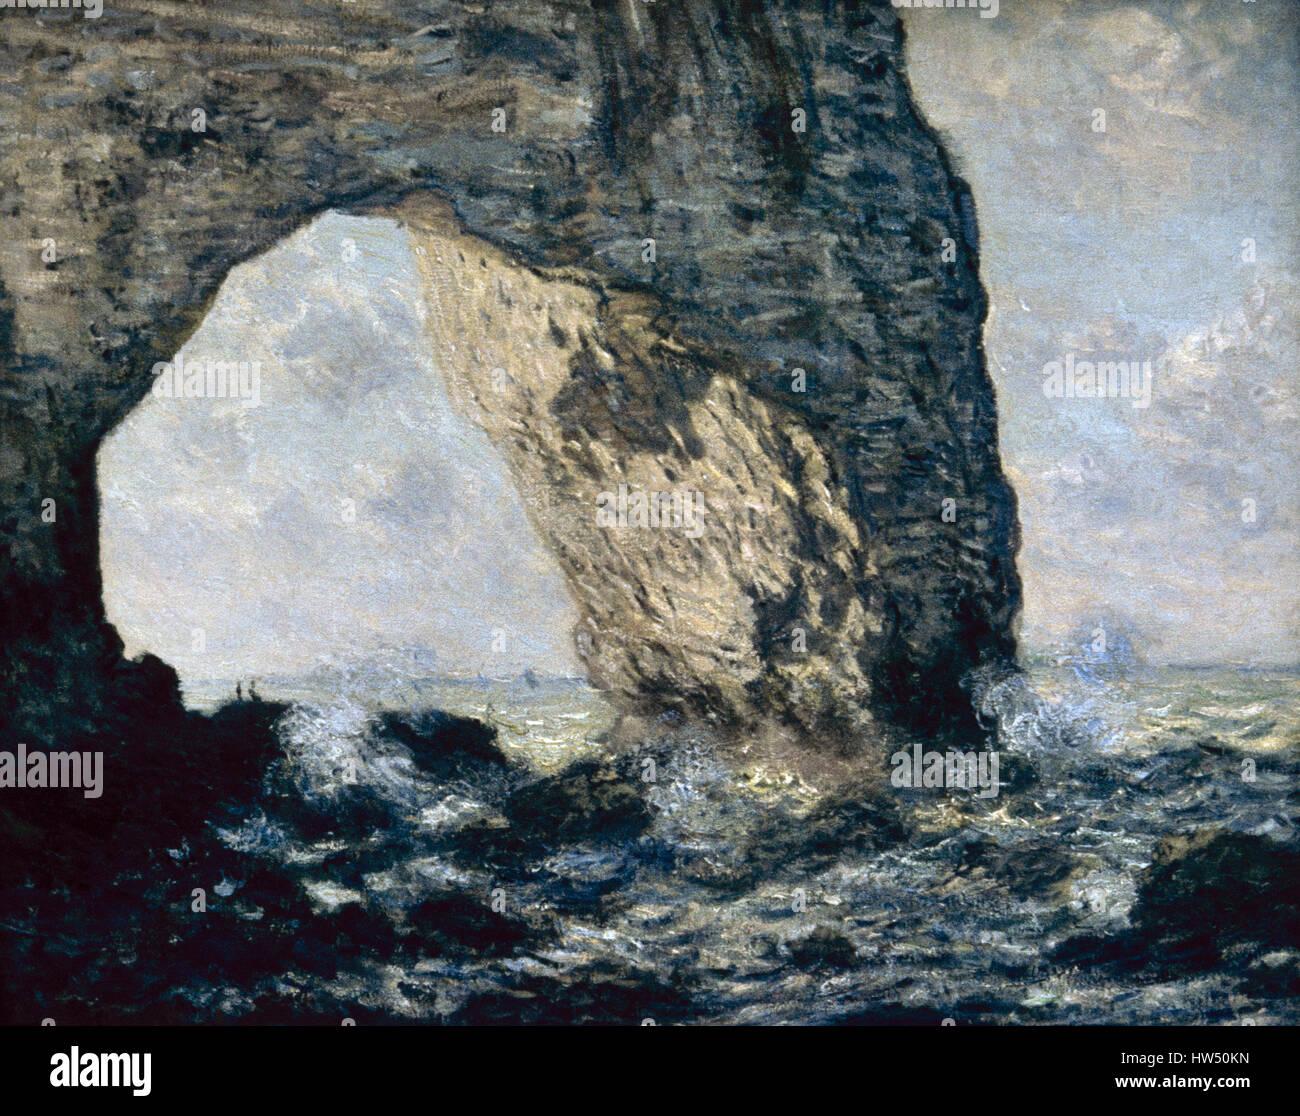 Claude Monet (1840-1926). Pittore Francese. Impressionismo. La Manneporte (Etretat), 1883. Olio su tela. Costa della Immagini Stock